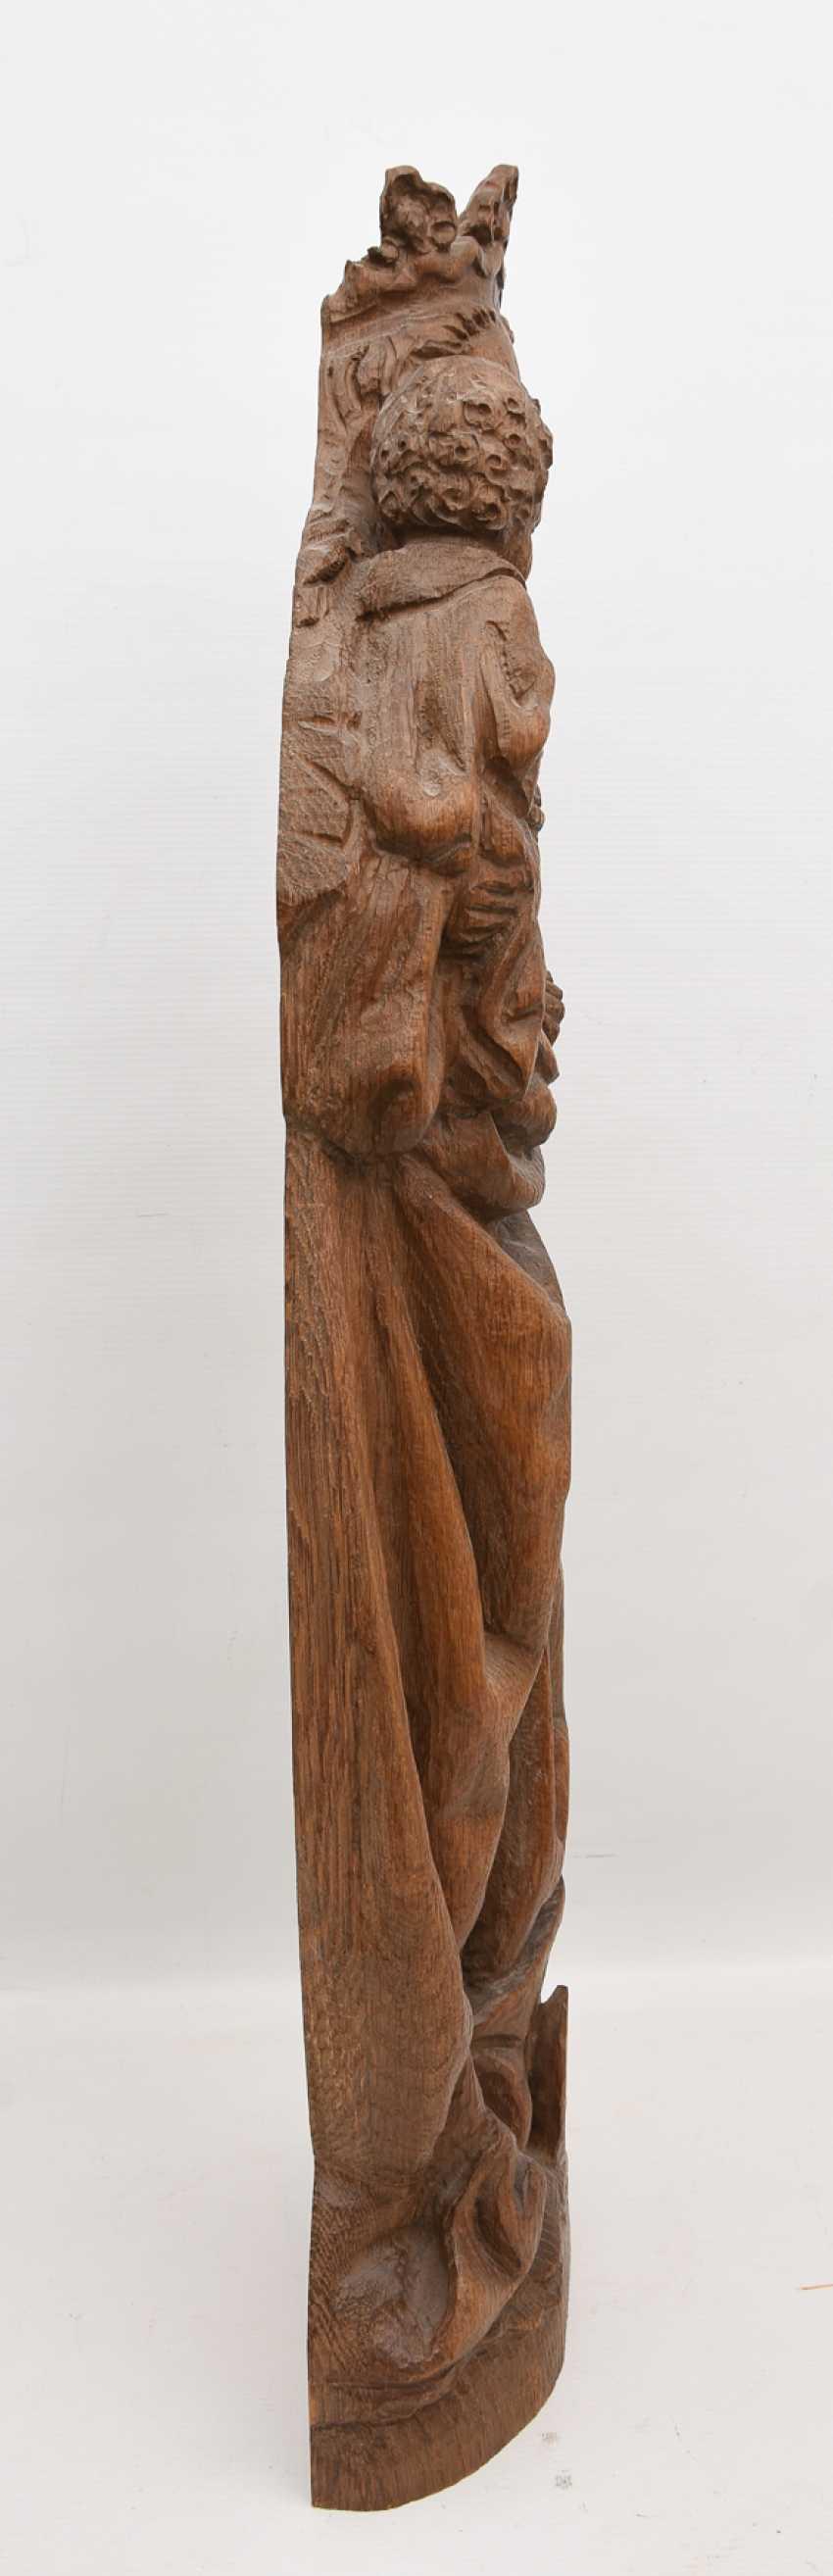 OSNABRÜCK MADONNA, copy after the Original, beschnitztes wood, antique stained, Oberammergau, 20. Century - photo 2